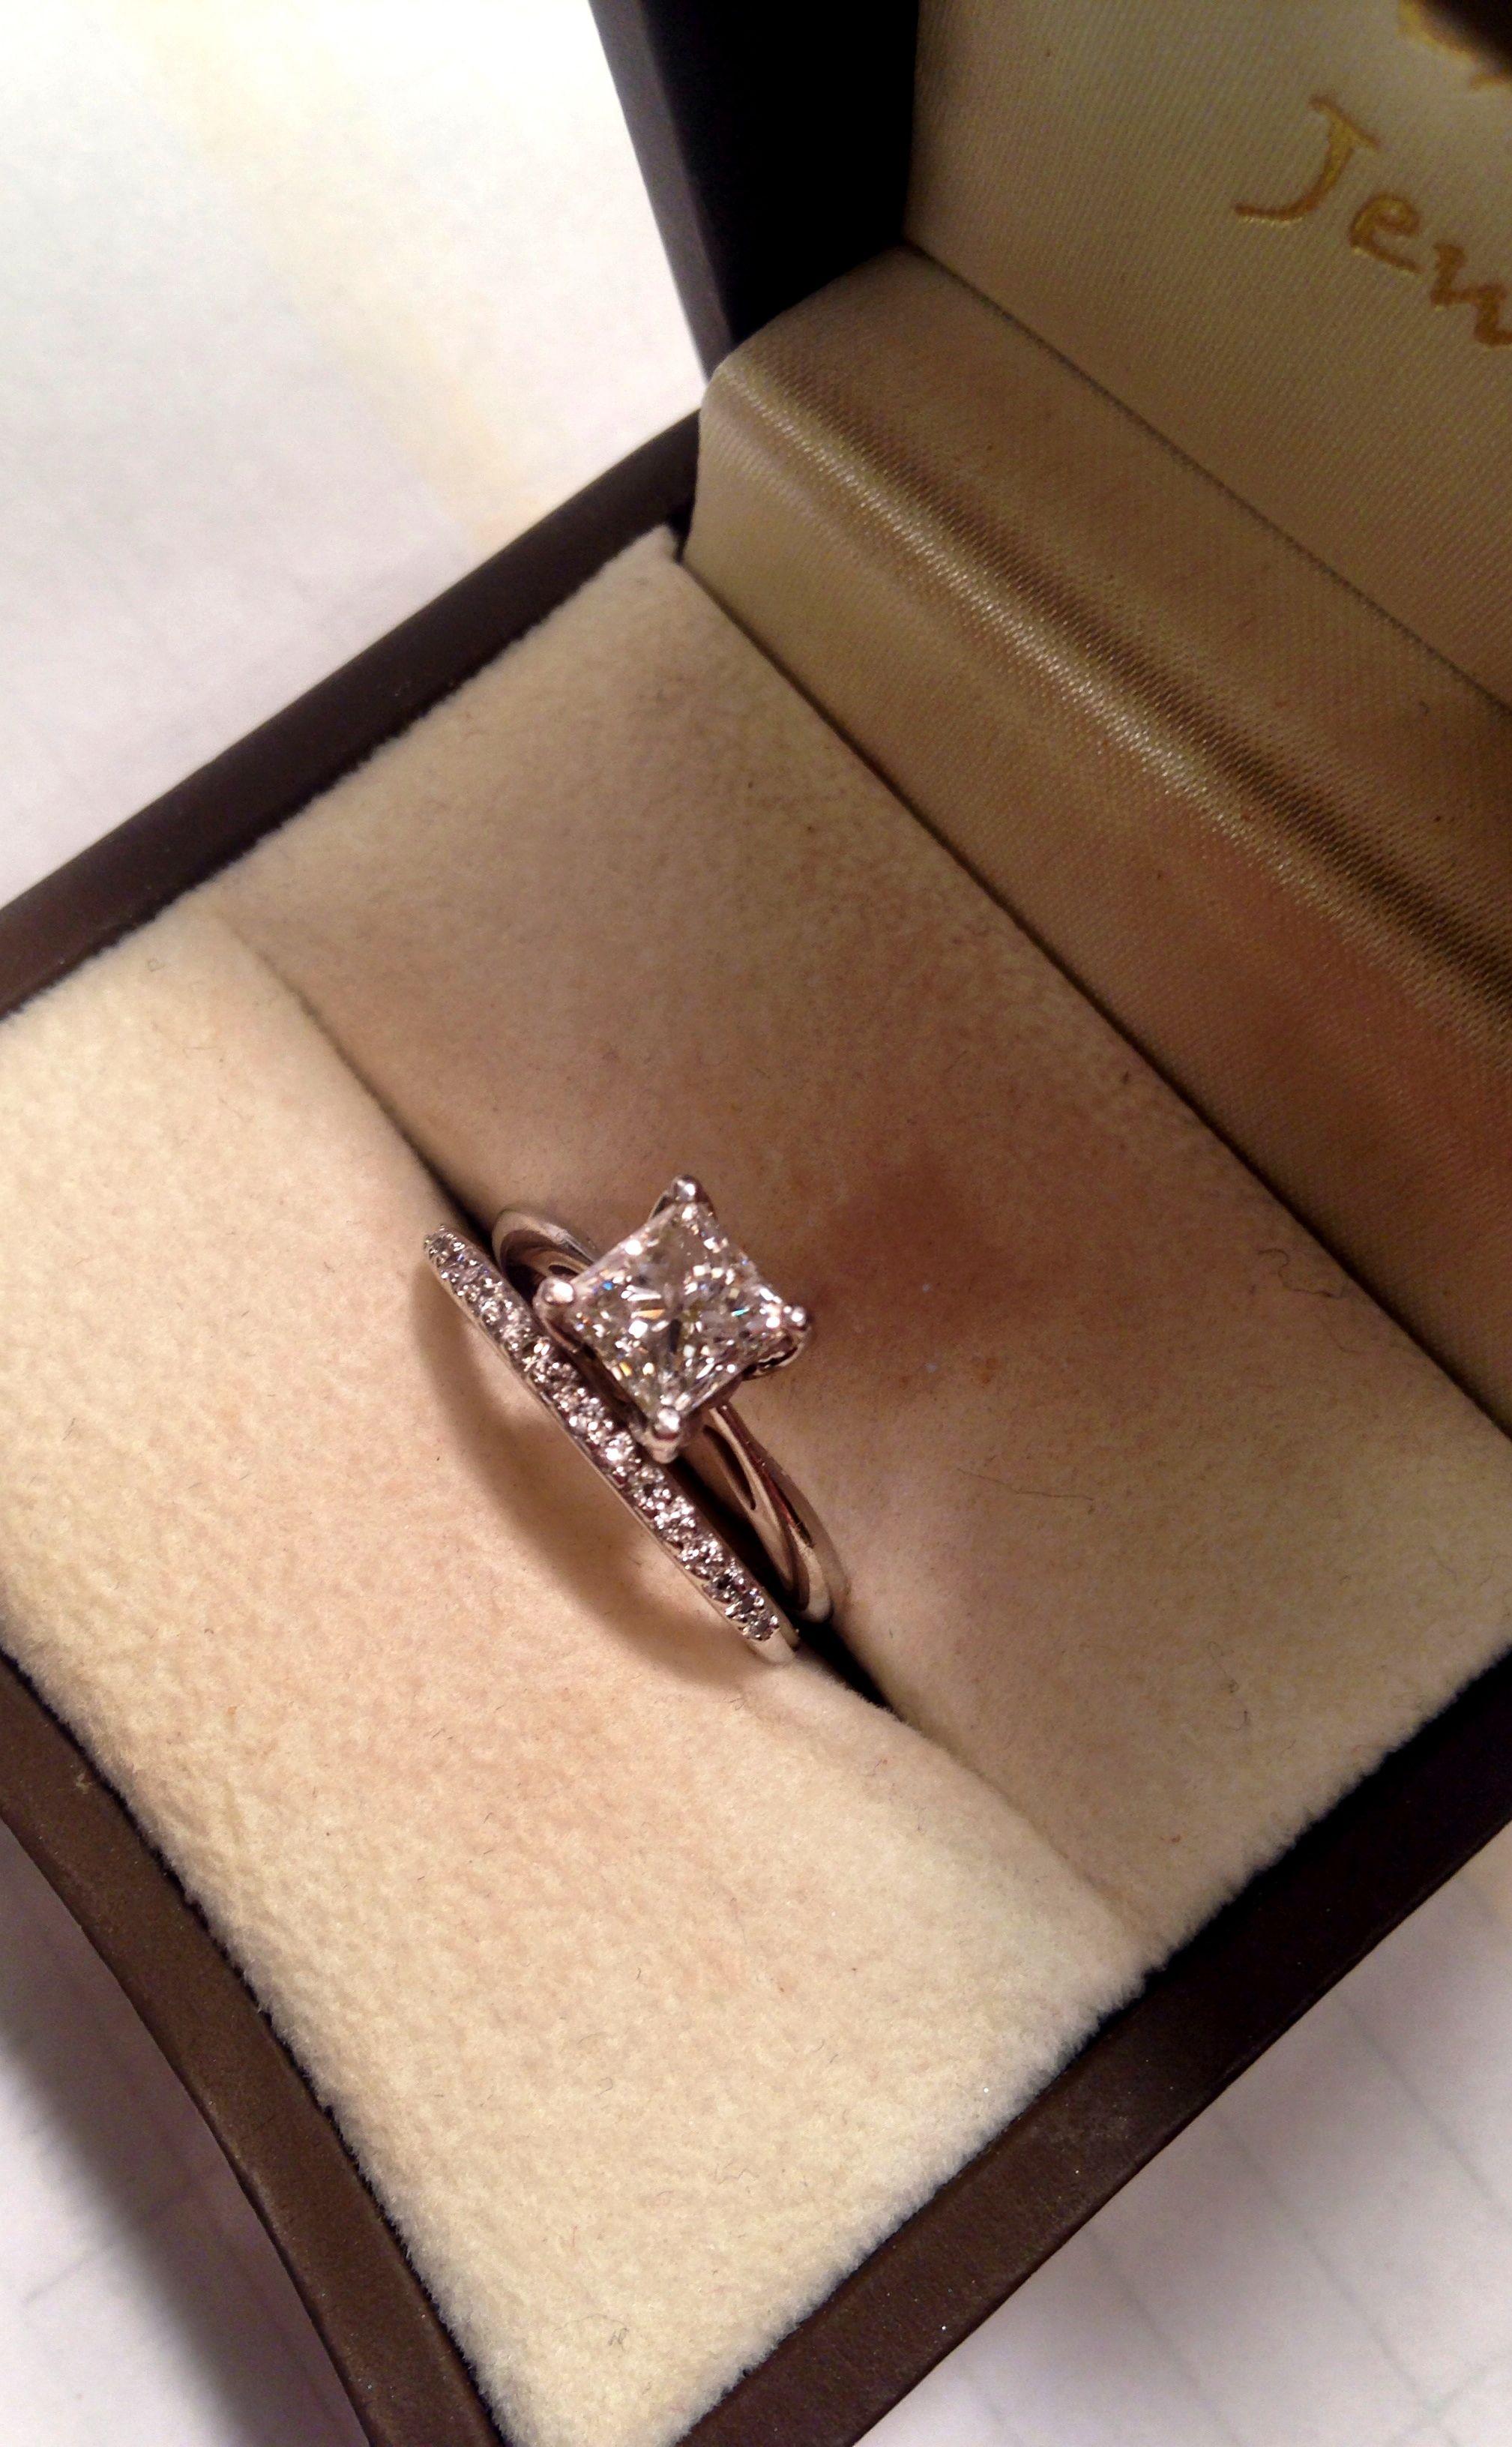 Solitaire engagement ringprincess cut diamond wedding bandus